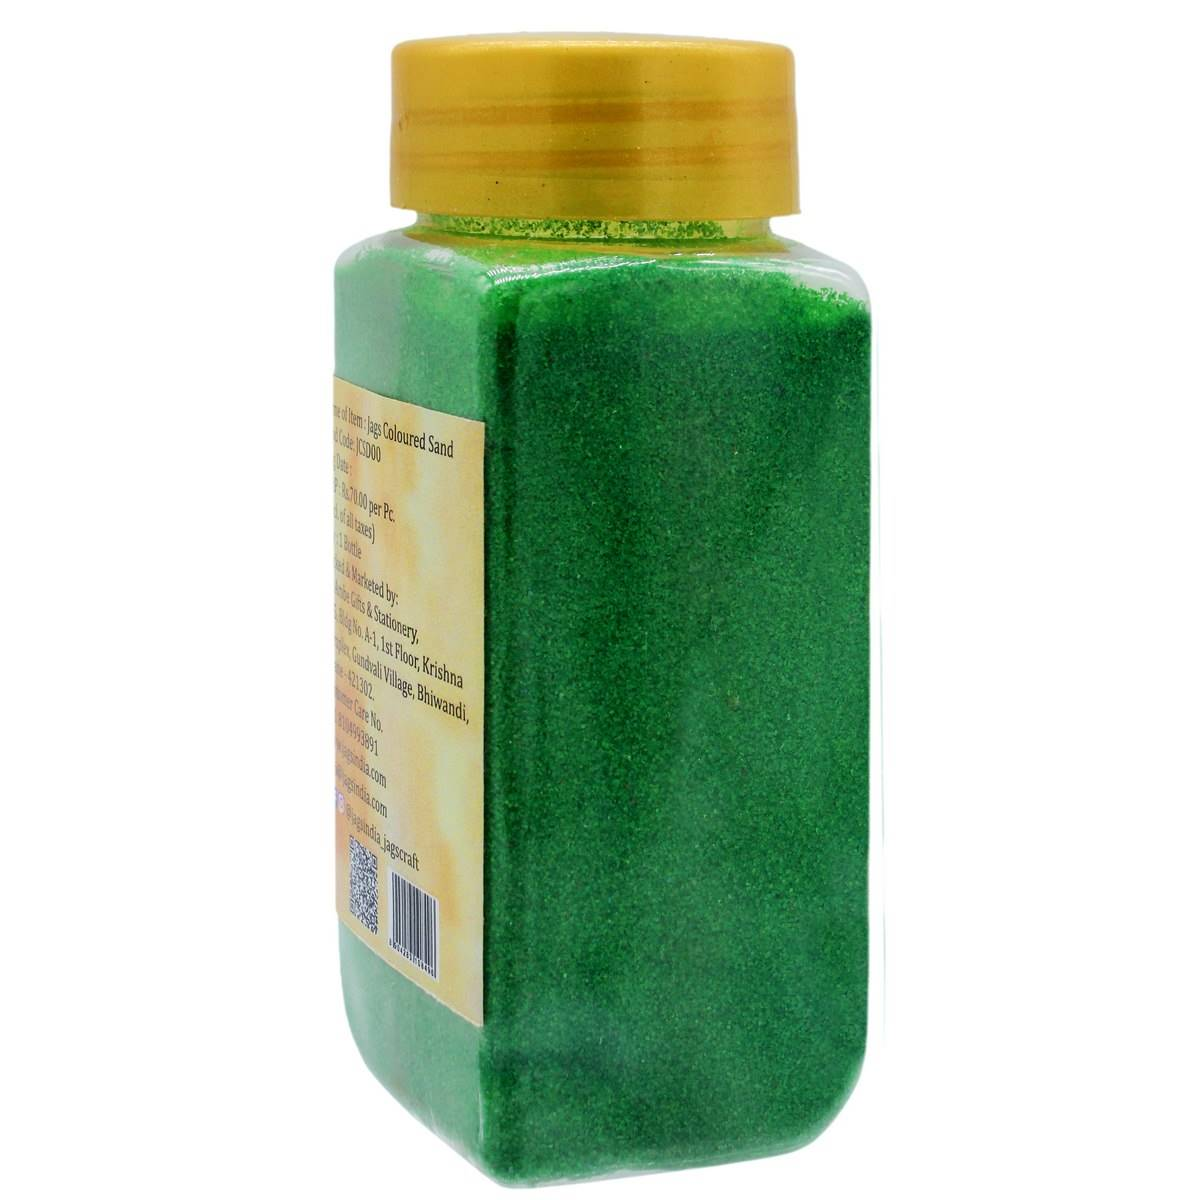 Coloured Sand Dark Green